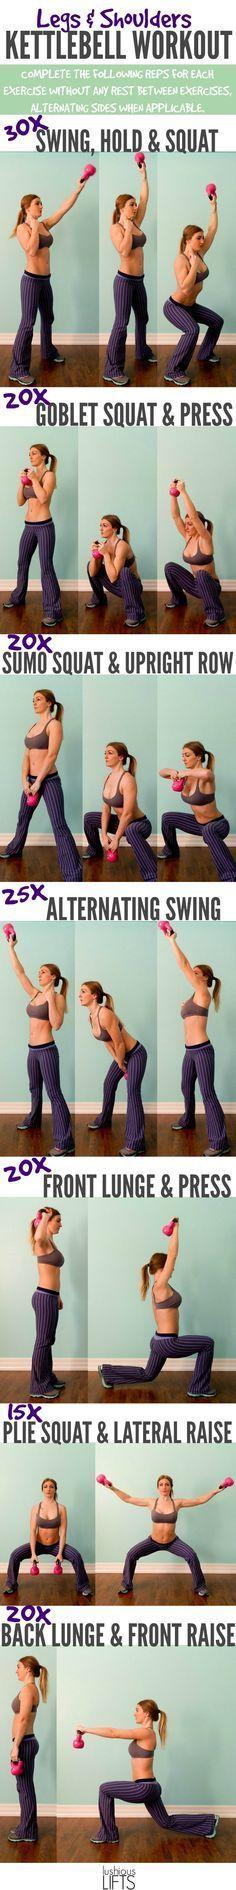 Legs and Shoulders Kettlebell Workout || Lushious Lifts https://www.kettlebellmaniac.com/kettlebell-exercises/